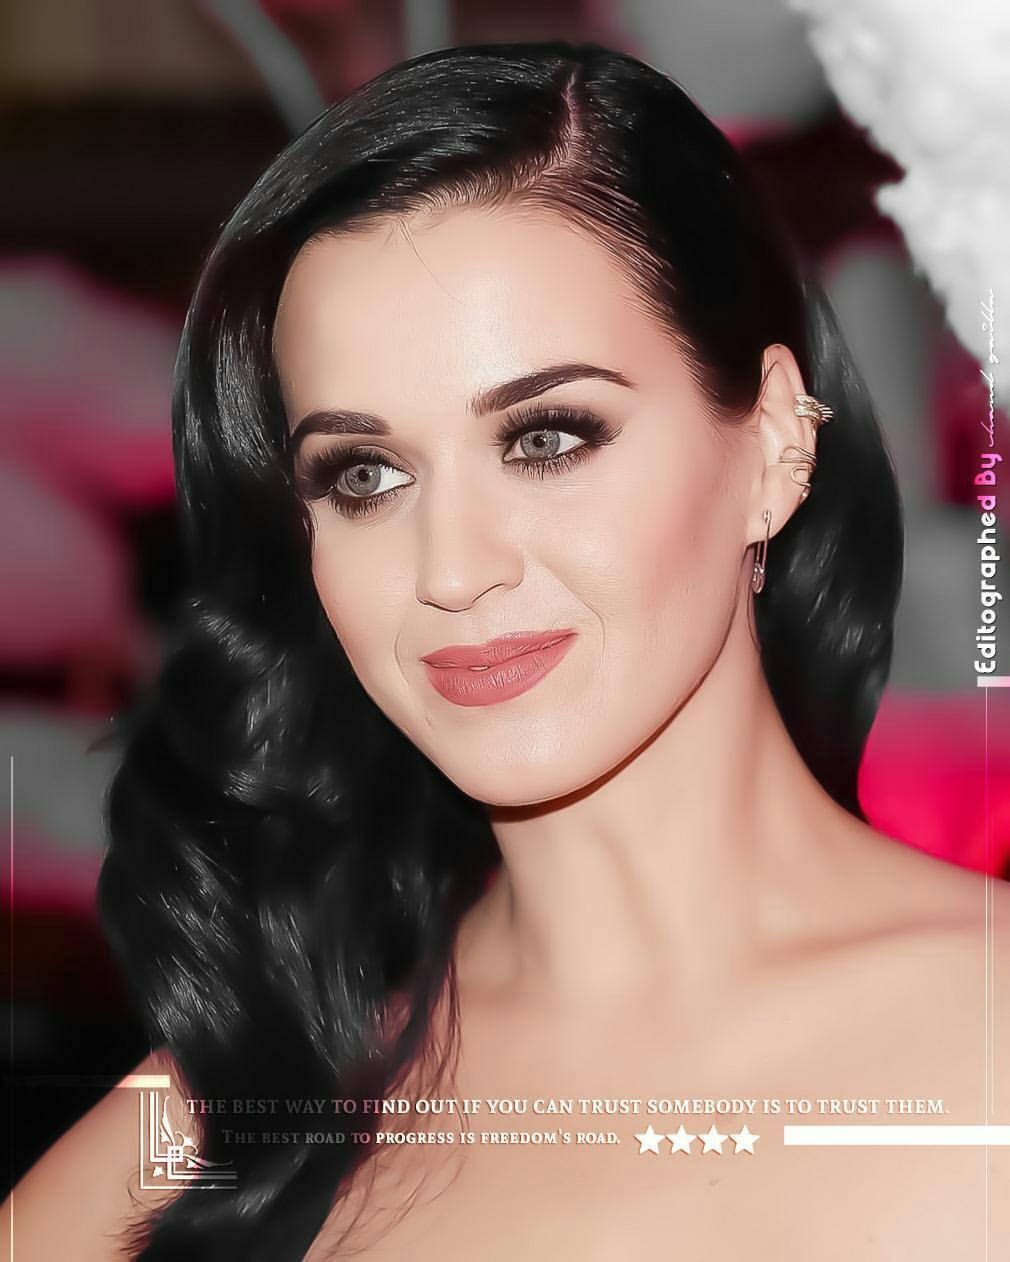 Katy Perry HD Wallpaper 2020